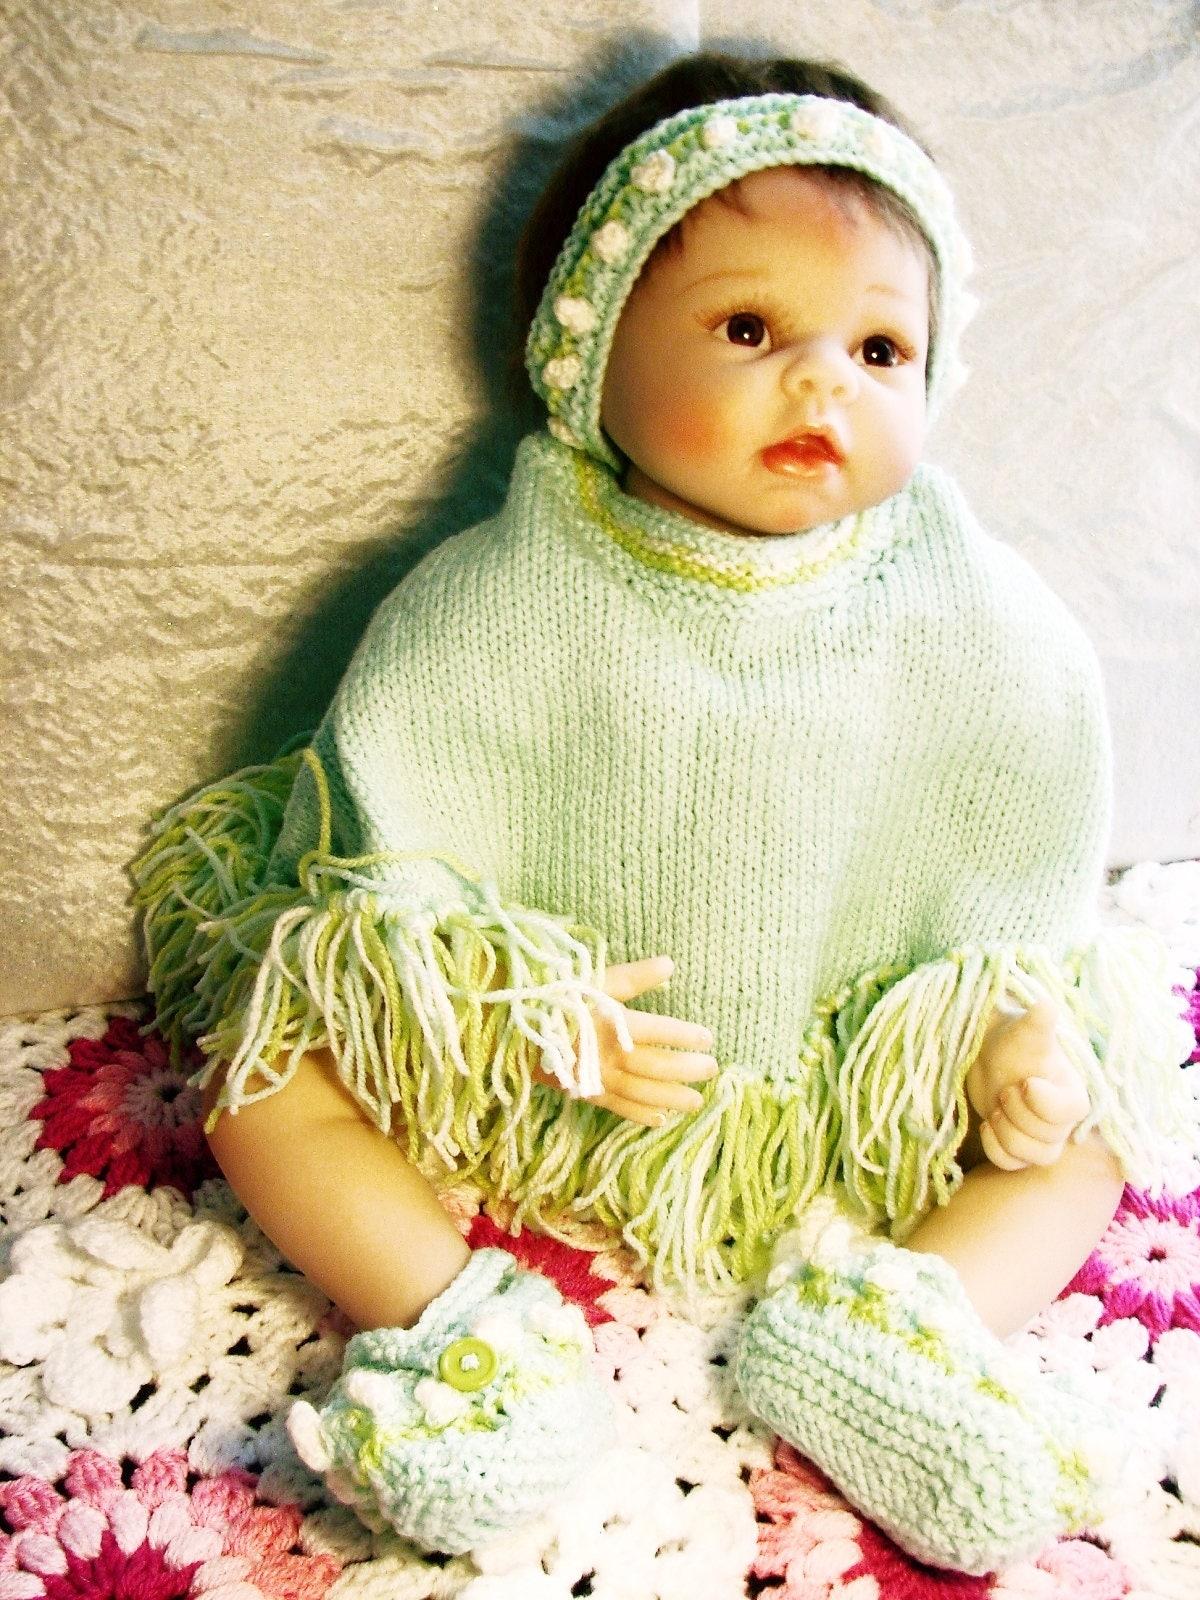 Baby Knitting Pattern - - Baby Poncho Set - Baby Knitting Pattern ...